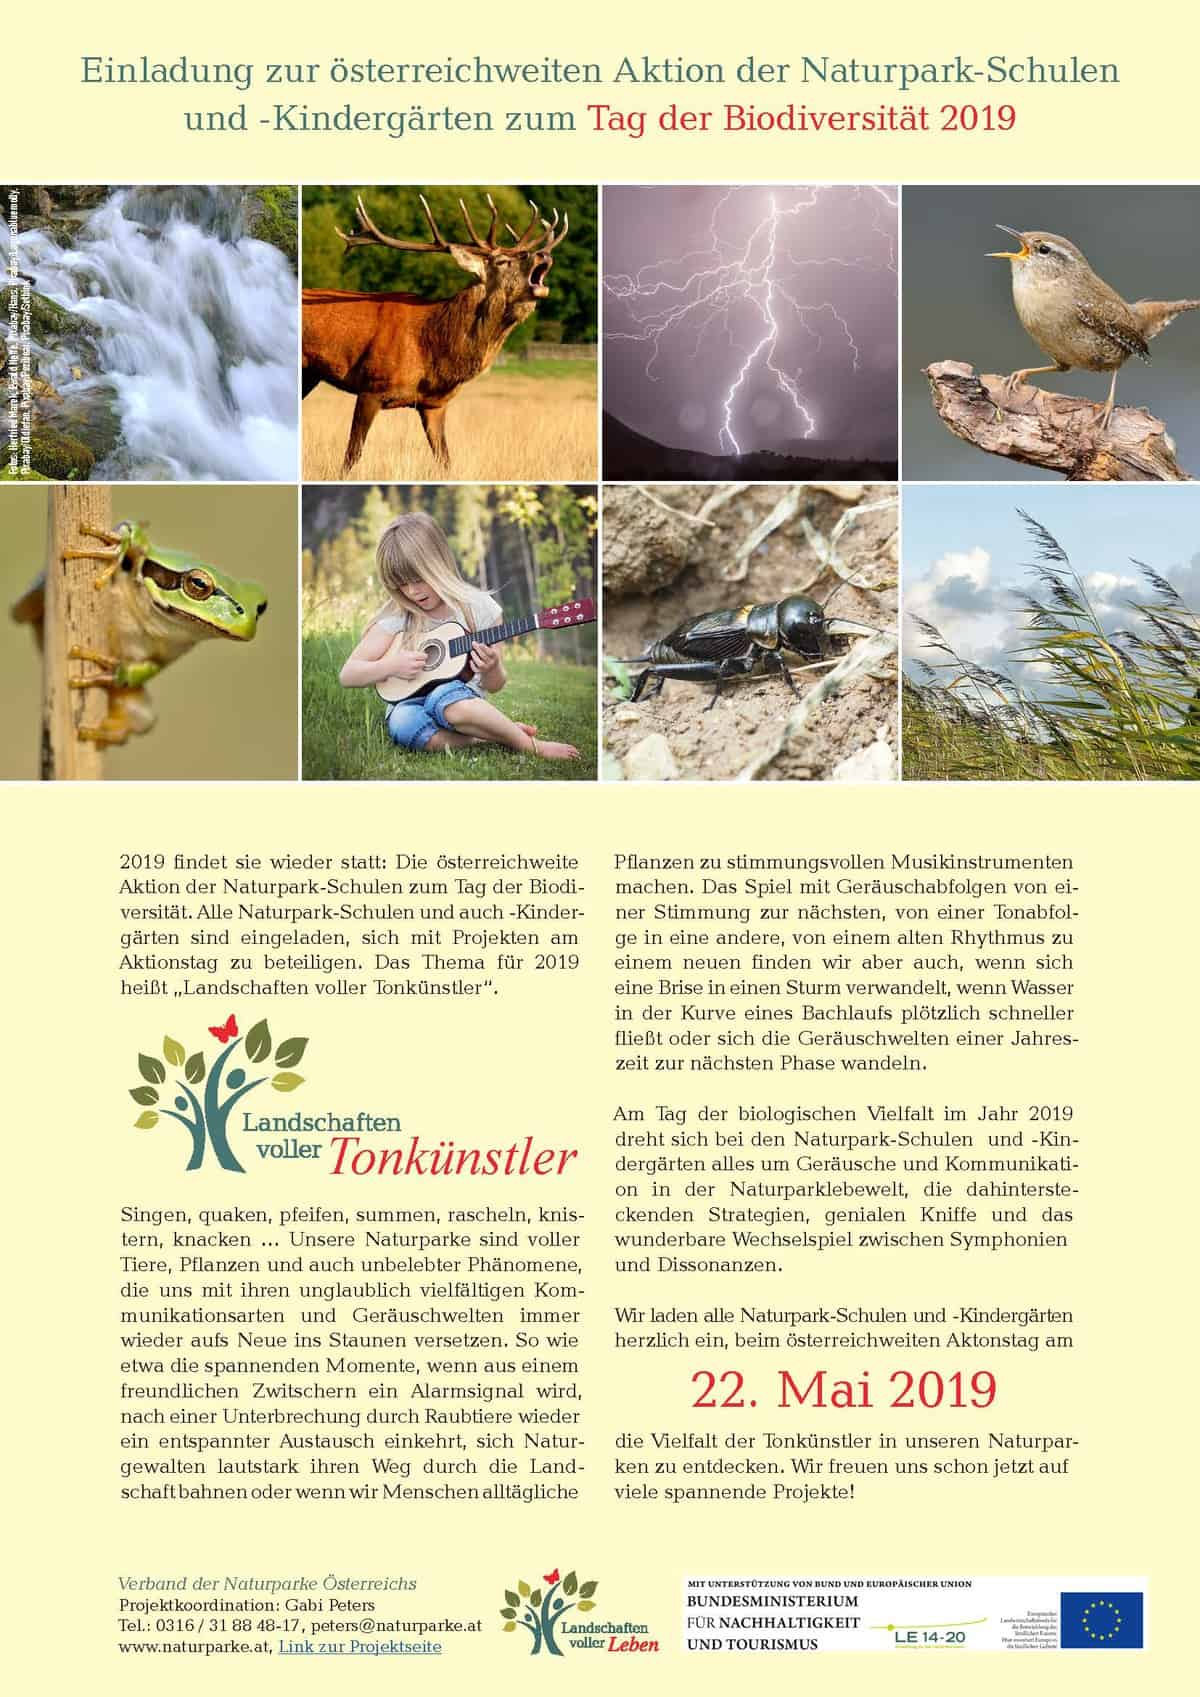 Tag der Artenvielfalt 2019 - Landschaften voller Tonkünstler 114